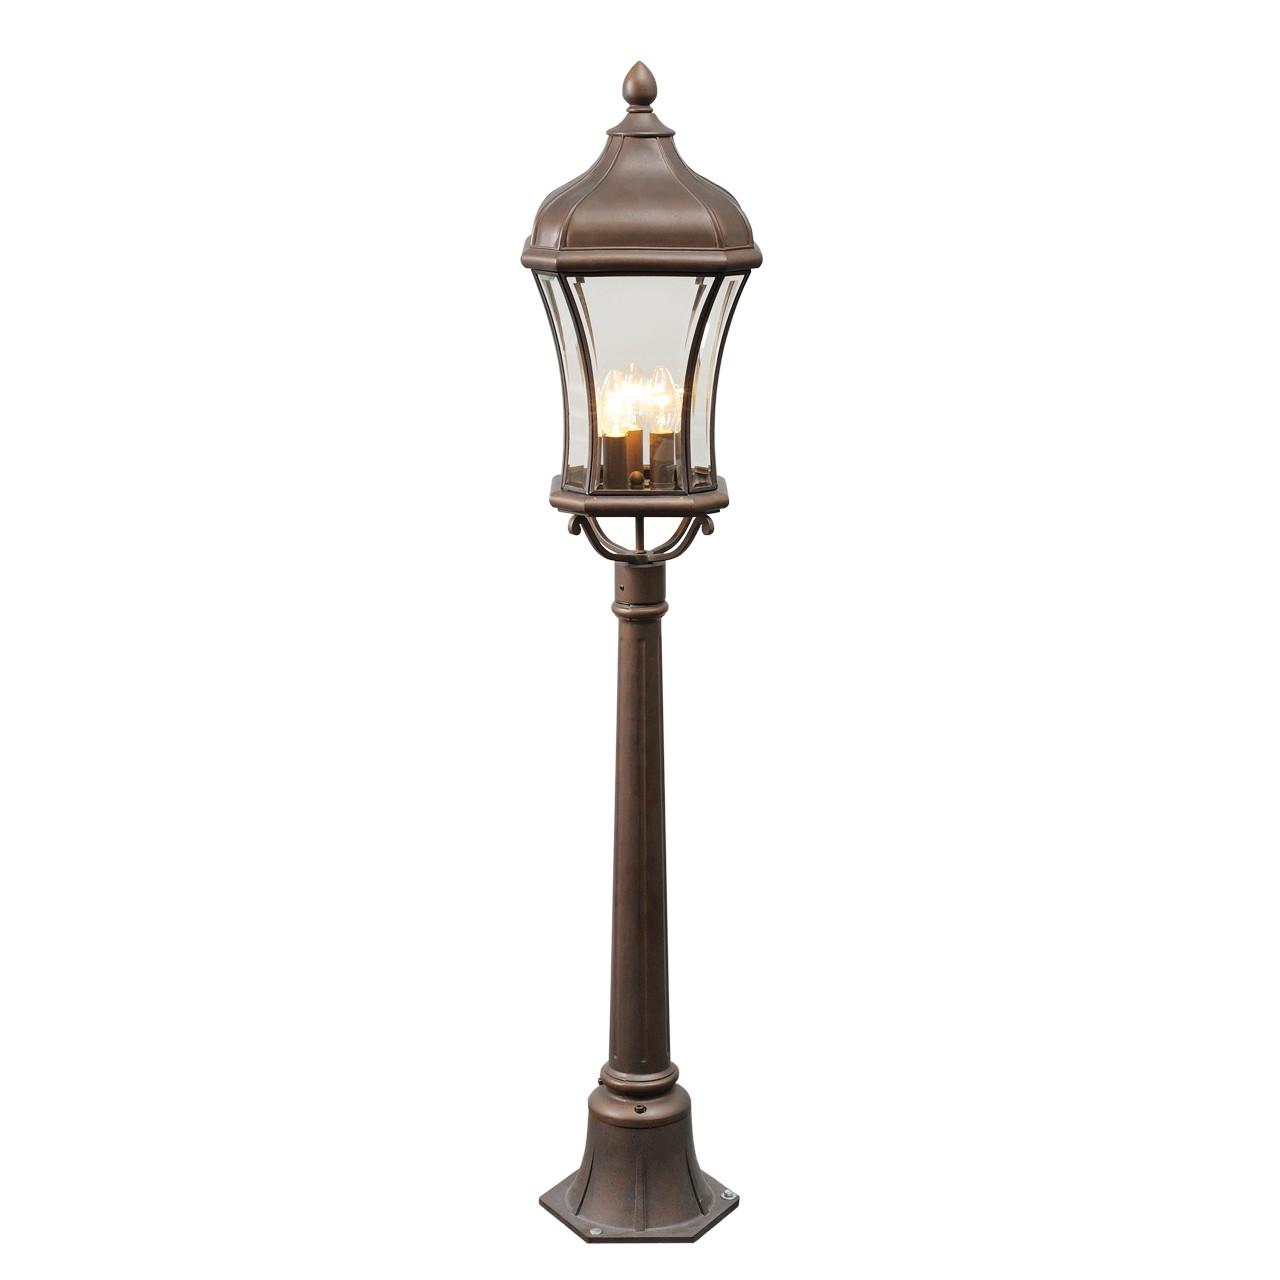 Уличный светильник Chiaro 800040203